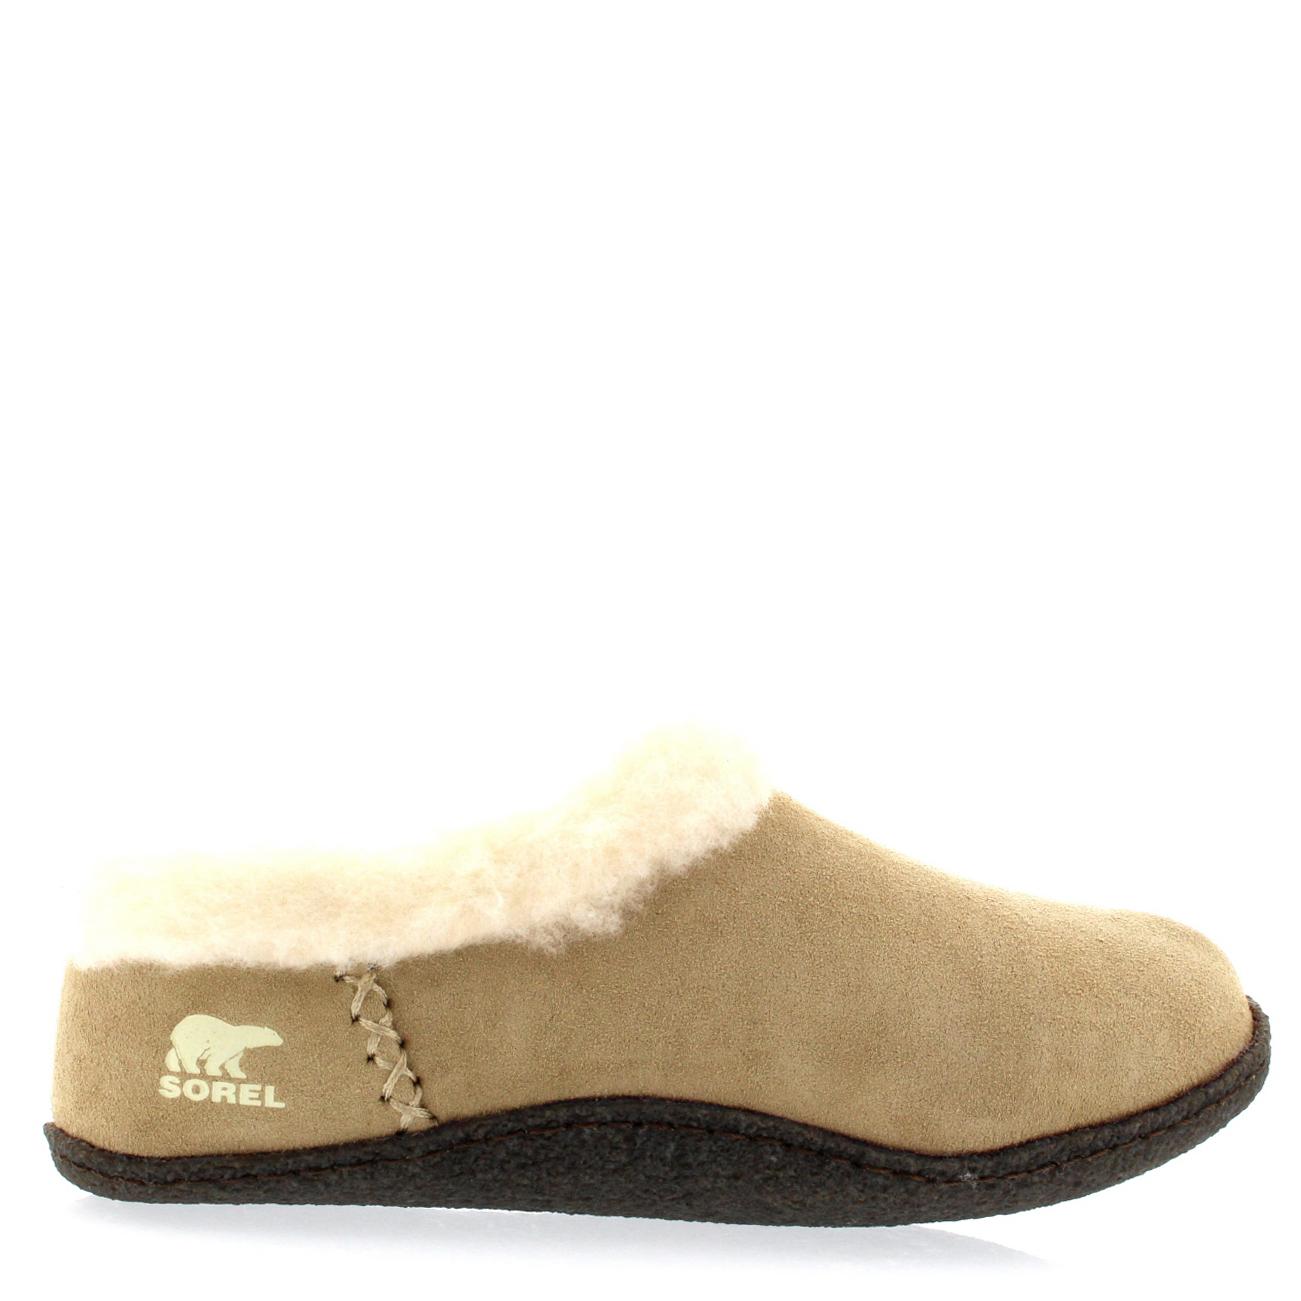 Damenschuhe Sorel Nakiska Winter House Fur Lined Warm Suede House Winter Schuhes Slippers UK 3-9 8c12bc